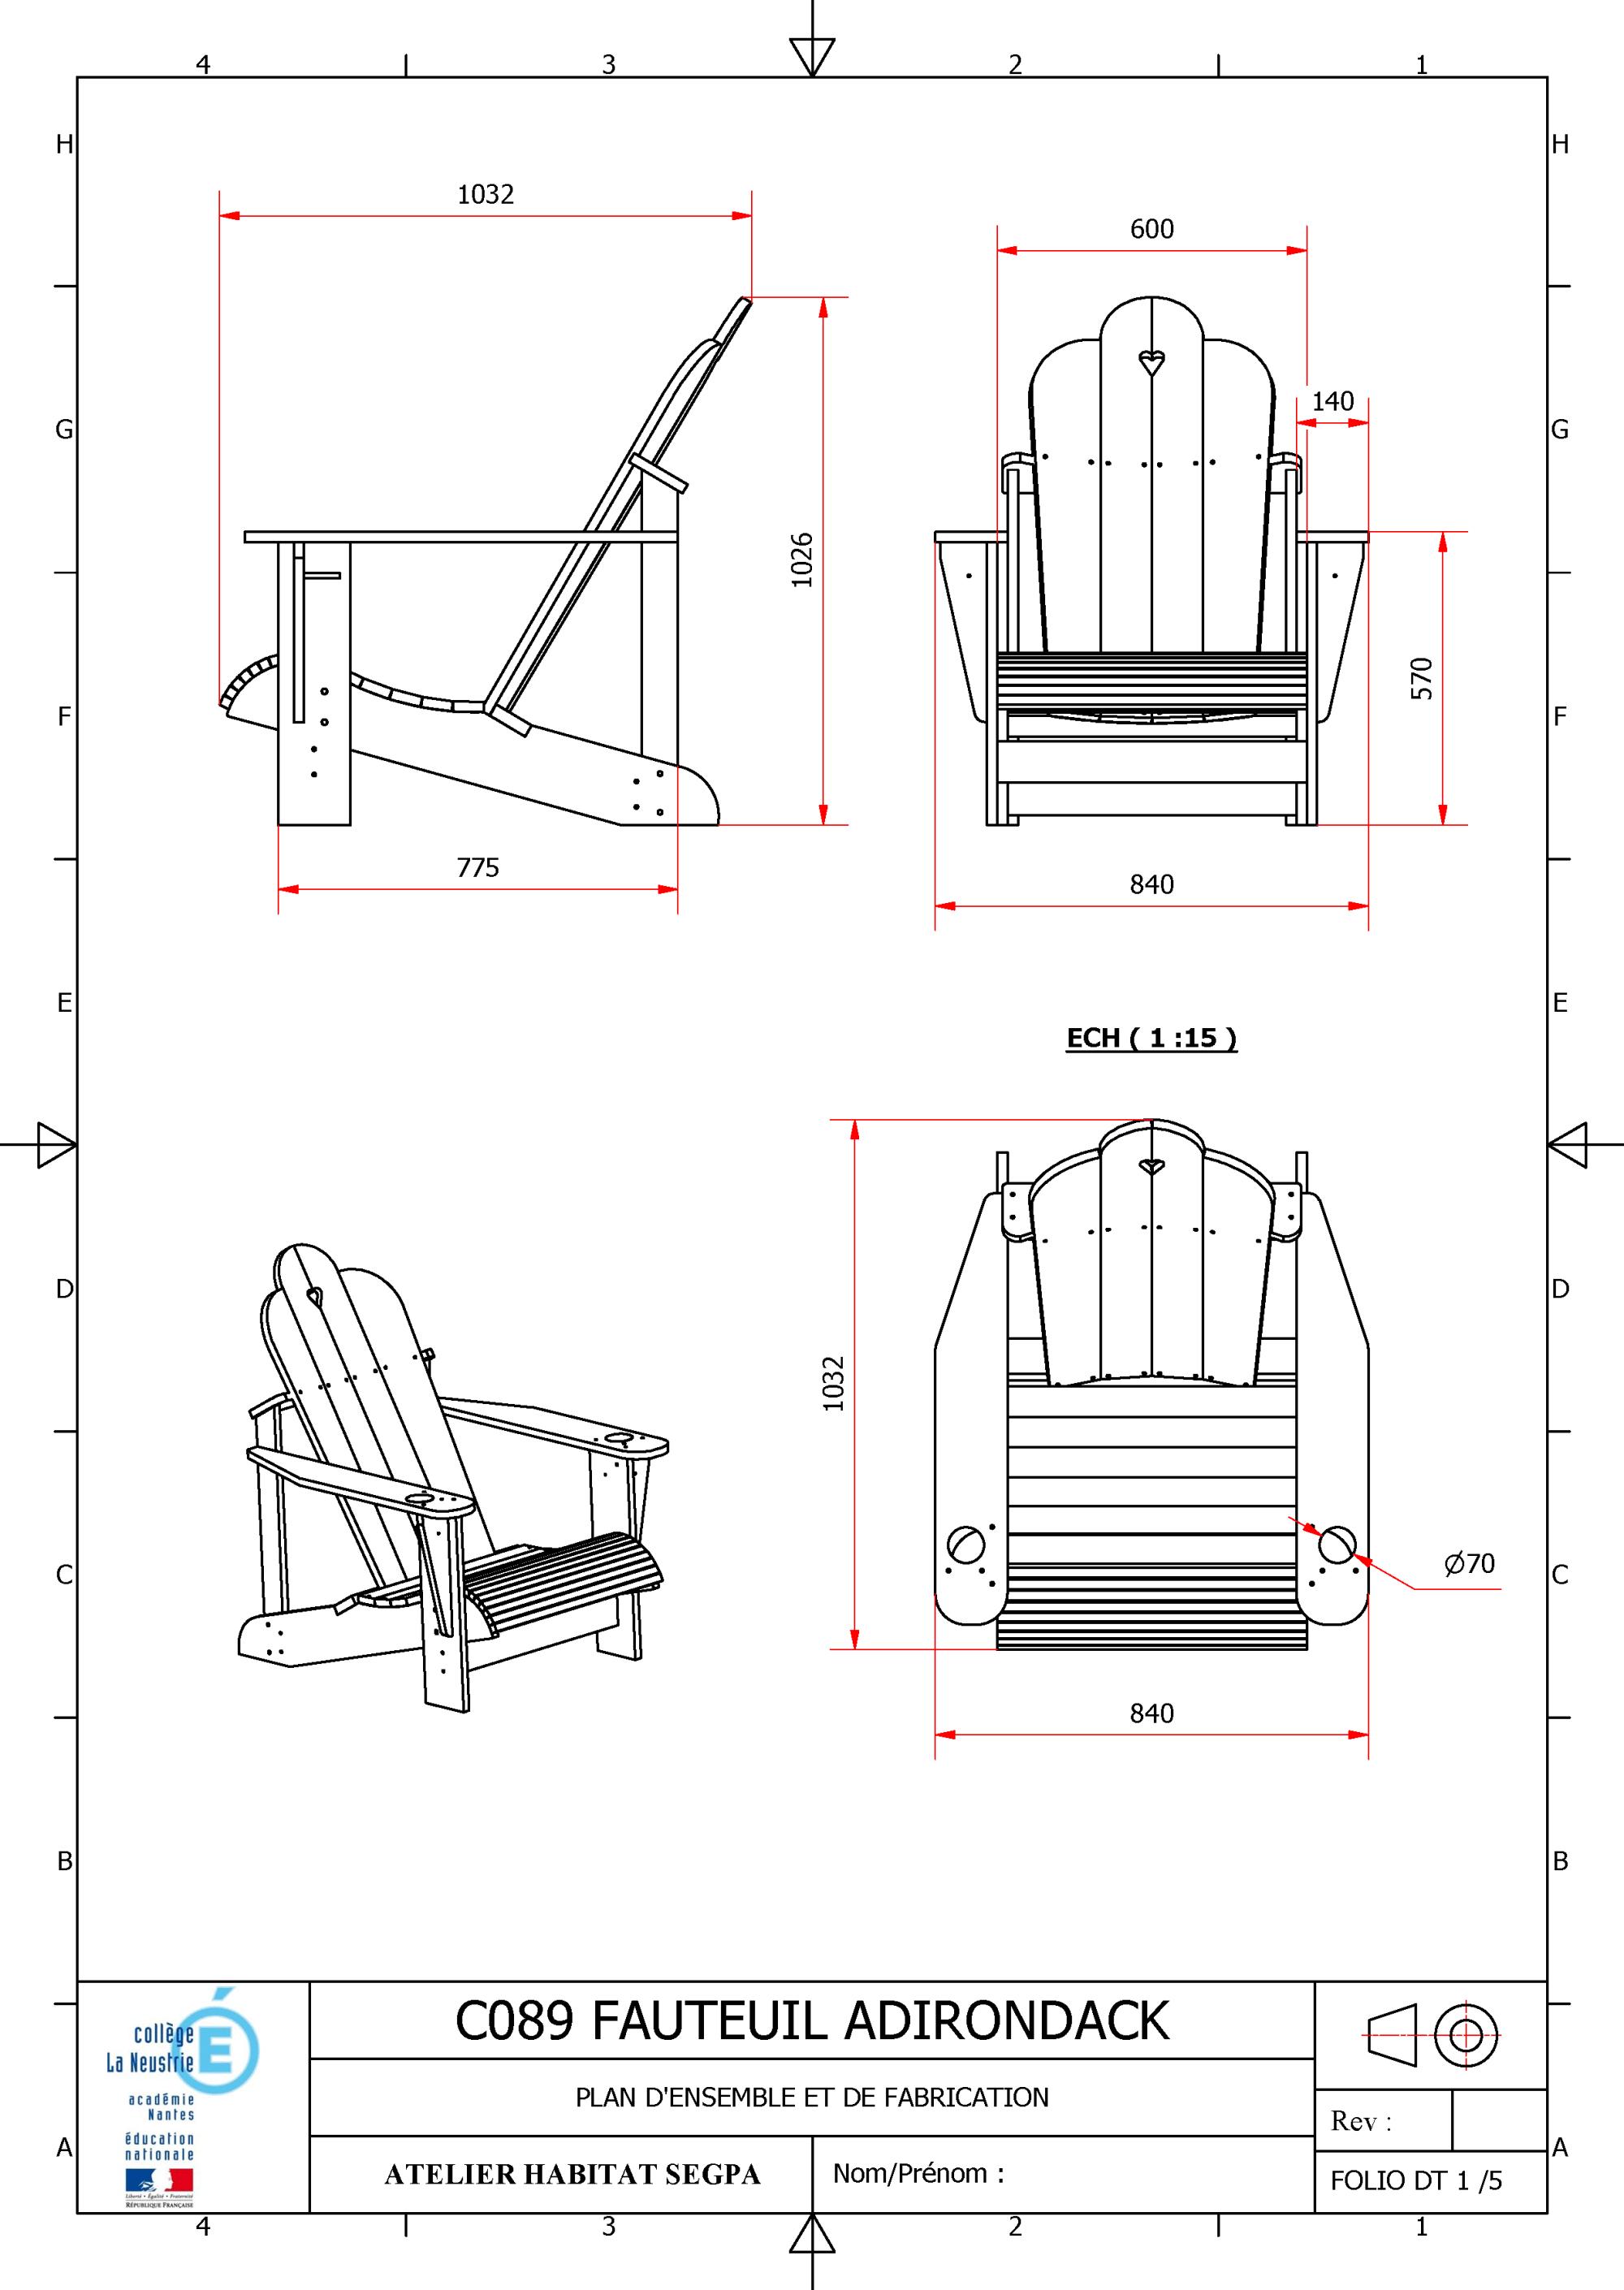 Salon De Jardin Americain adirondack | cadeiras de jardim, cadeiras de madeira, mesa e